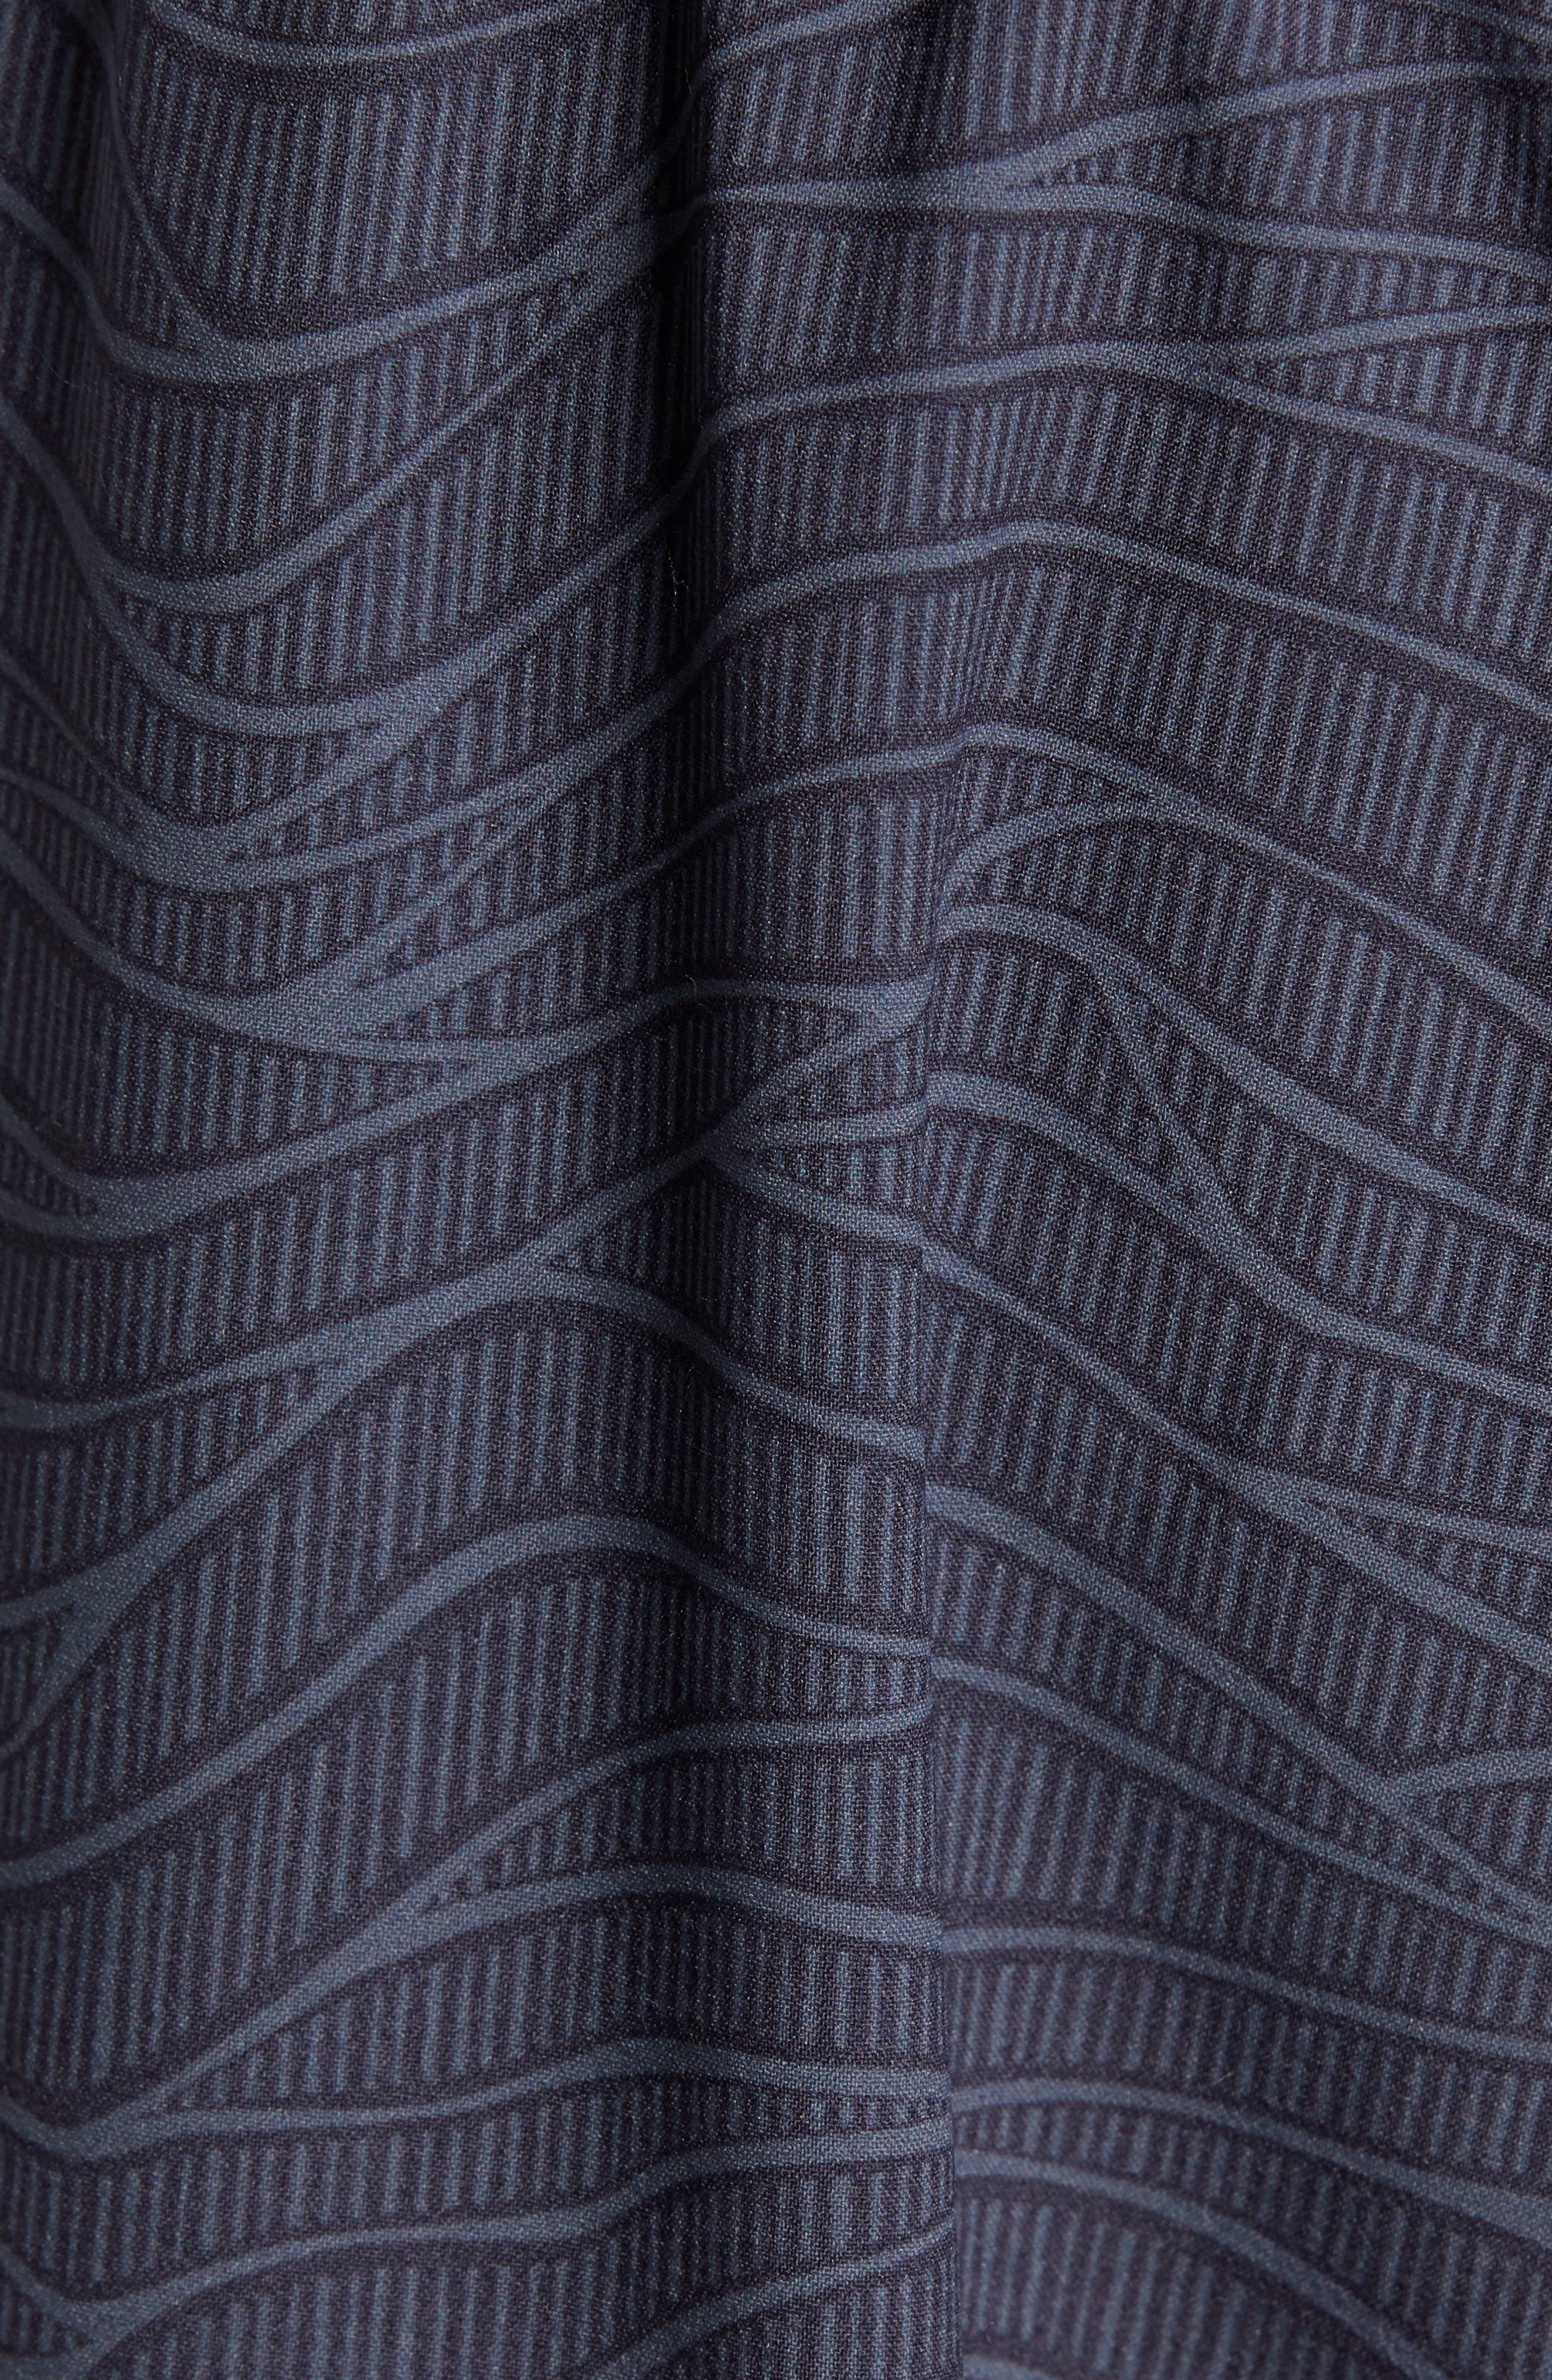 TASC PERFORMANCE, Propulsion Athletic Shorts, Alternate thumbnail 6, color, BLACK SONIC WAVE